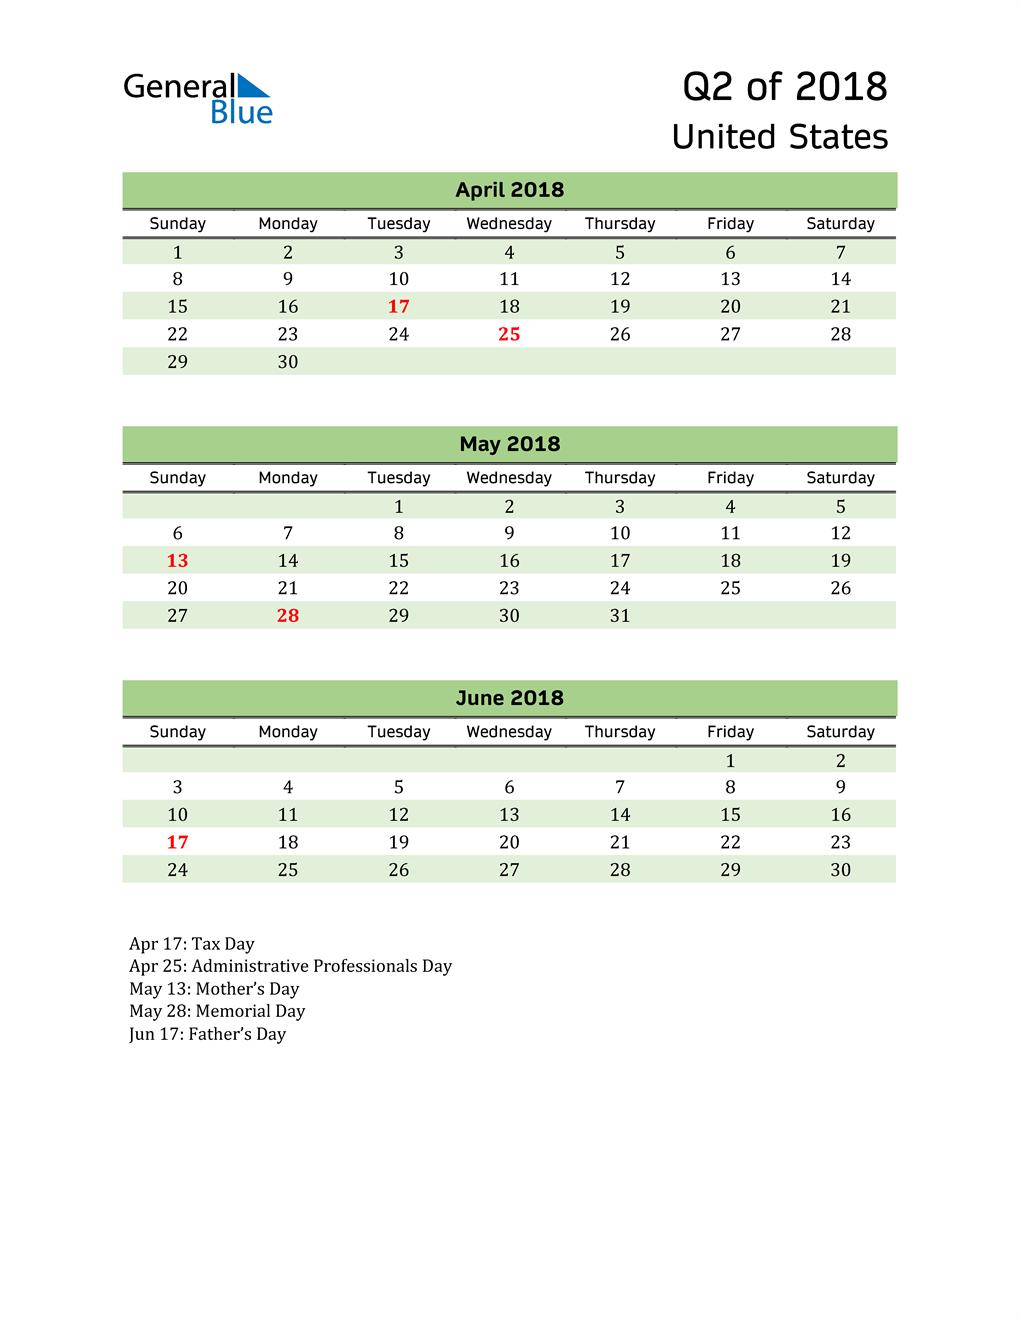 Quarterly Calendar 2018 with United States Holidays